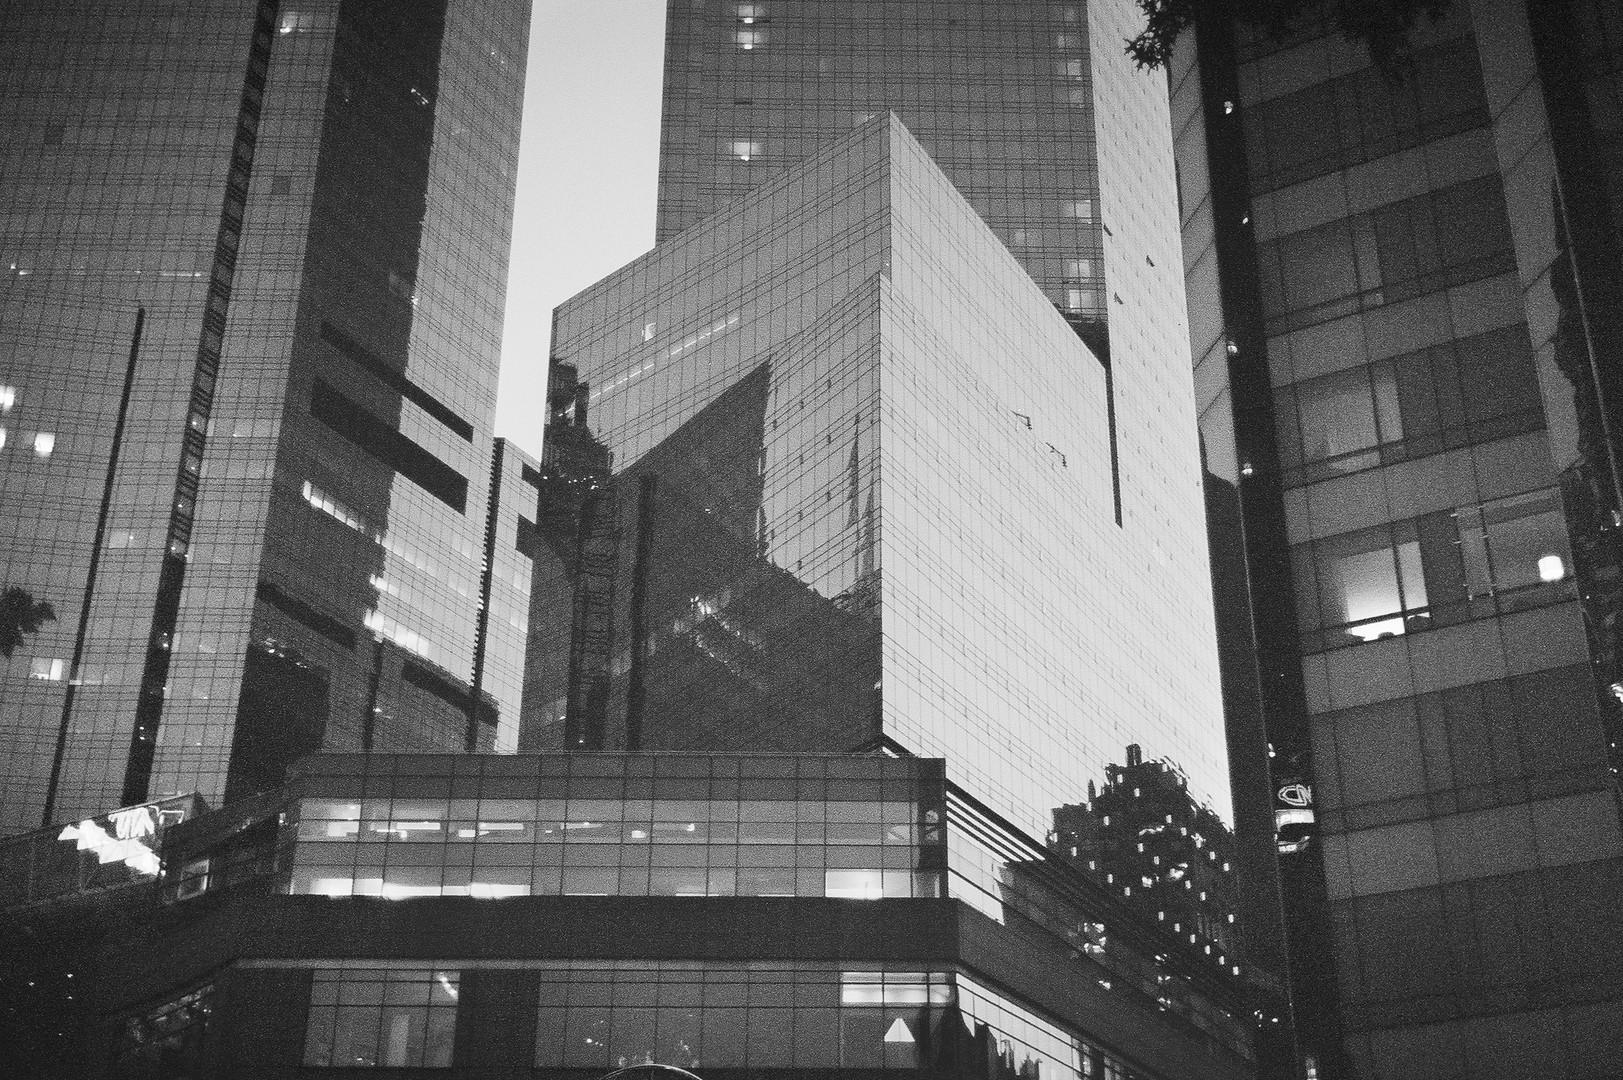 NYC-1-4.jpg